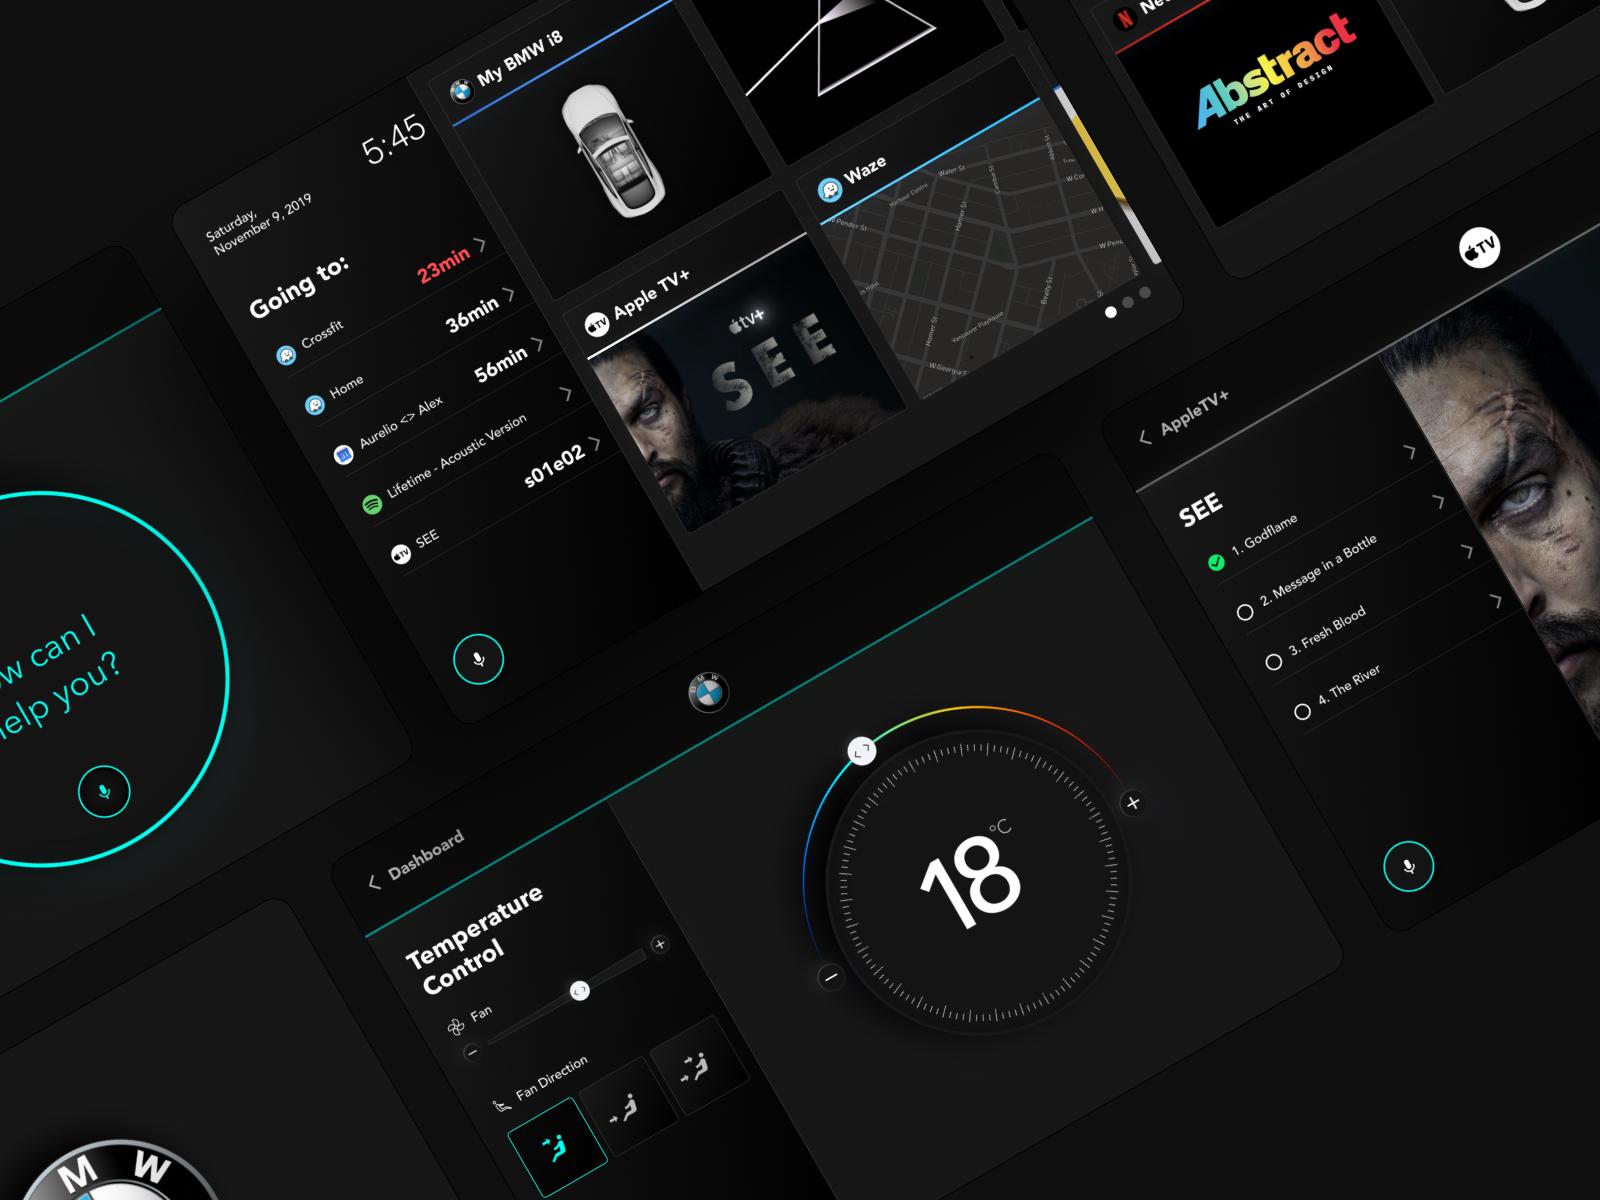 BMW i8 (Infotainment System for cars | Design Concept)